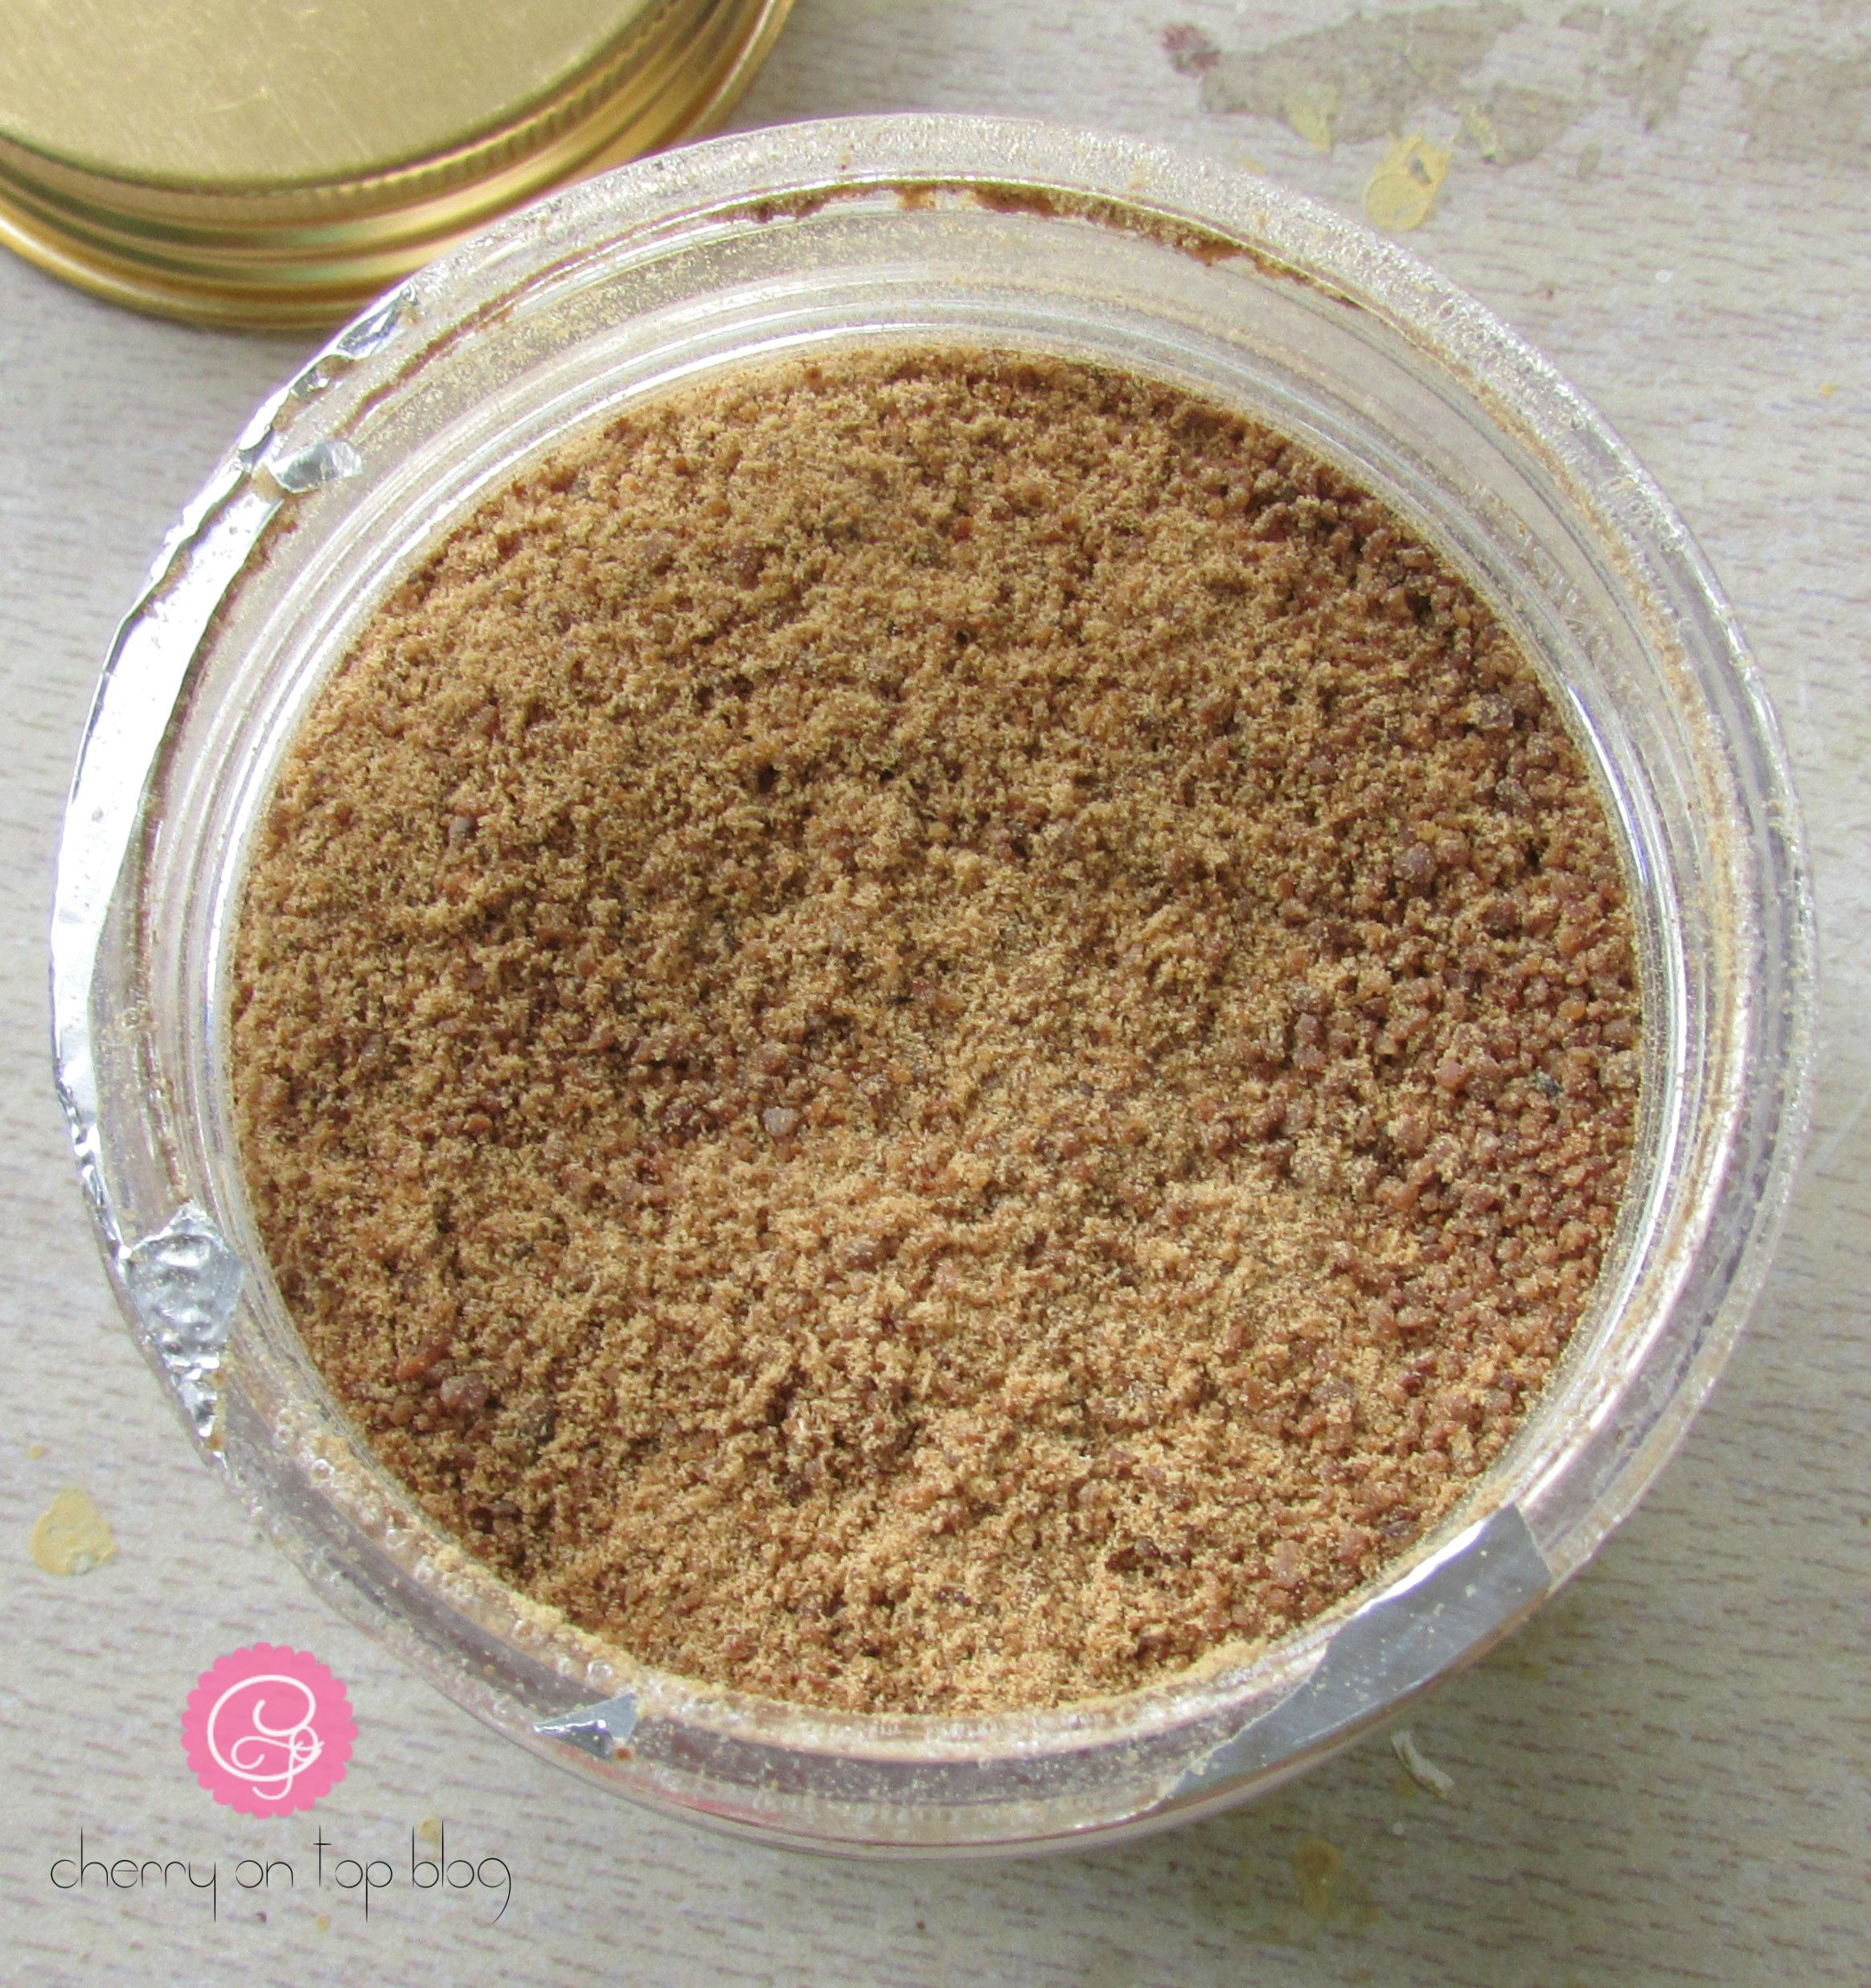 Junaili Apricot Body Scrub| Cherry On Top